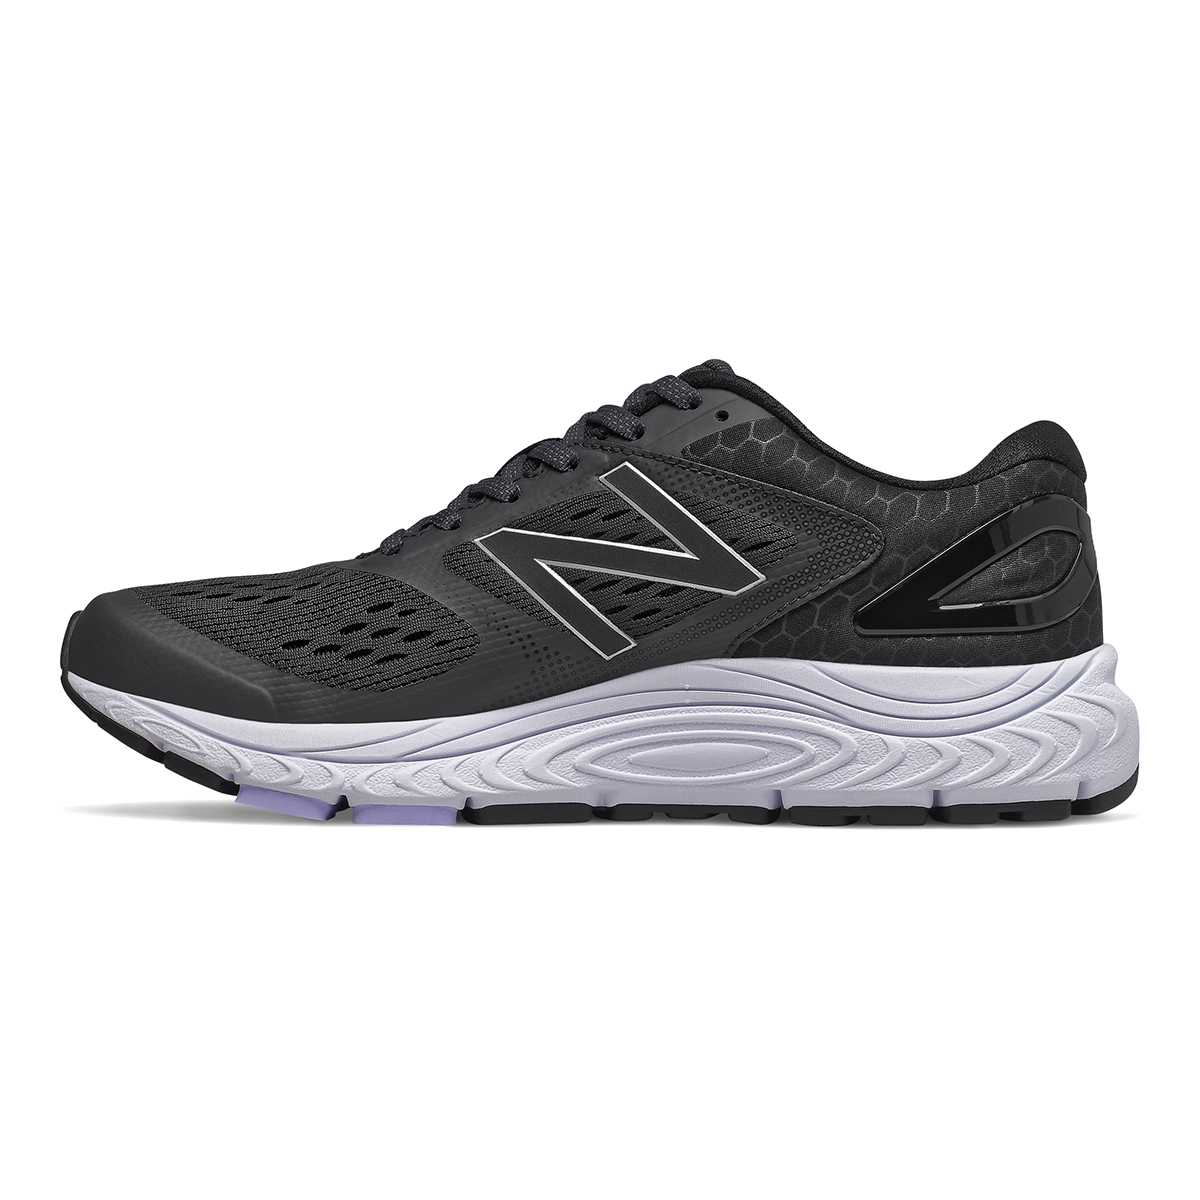 Women's New Balance 840V4 Walking Shoe - Color: Black - Size: 5 - Width: Narrow, Black, large, image 2